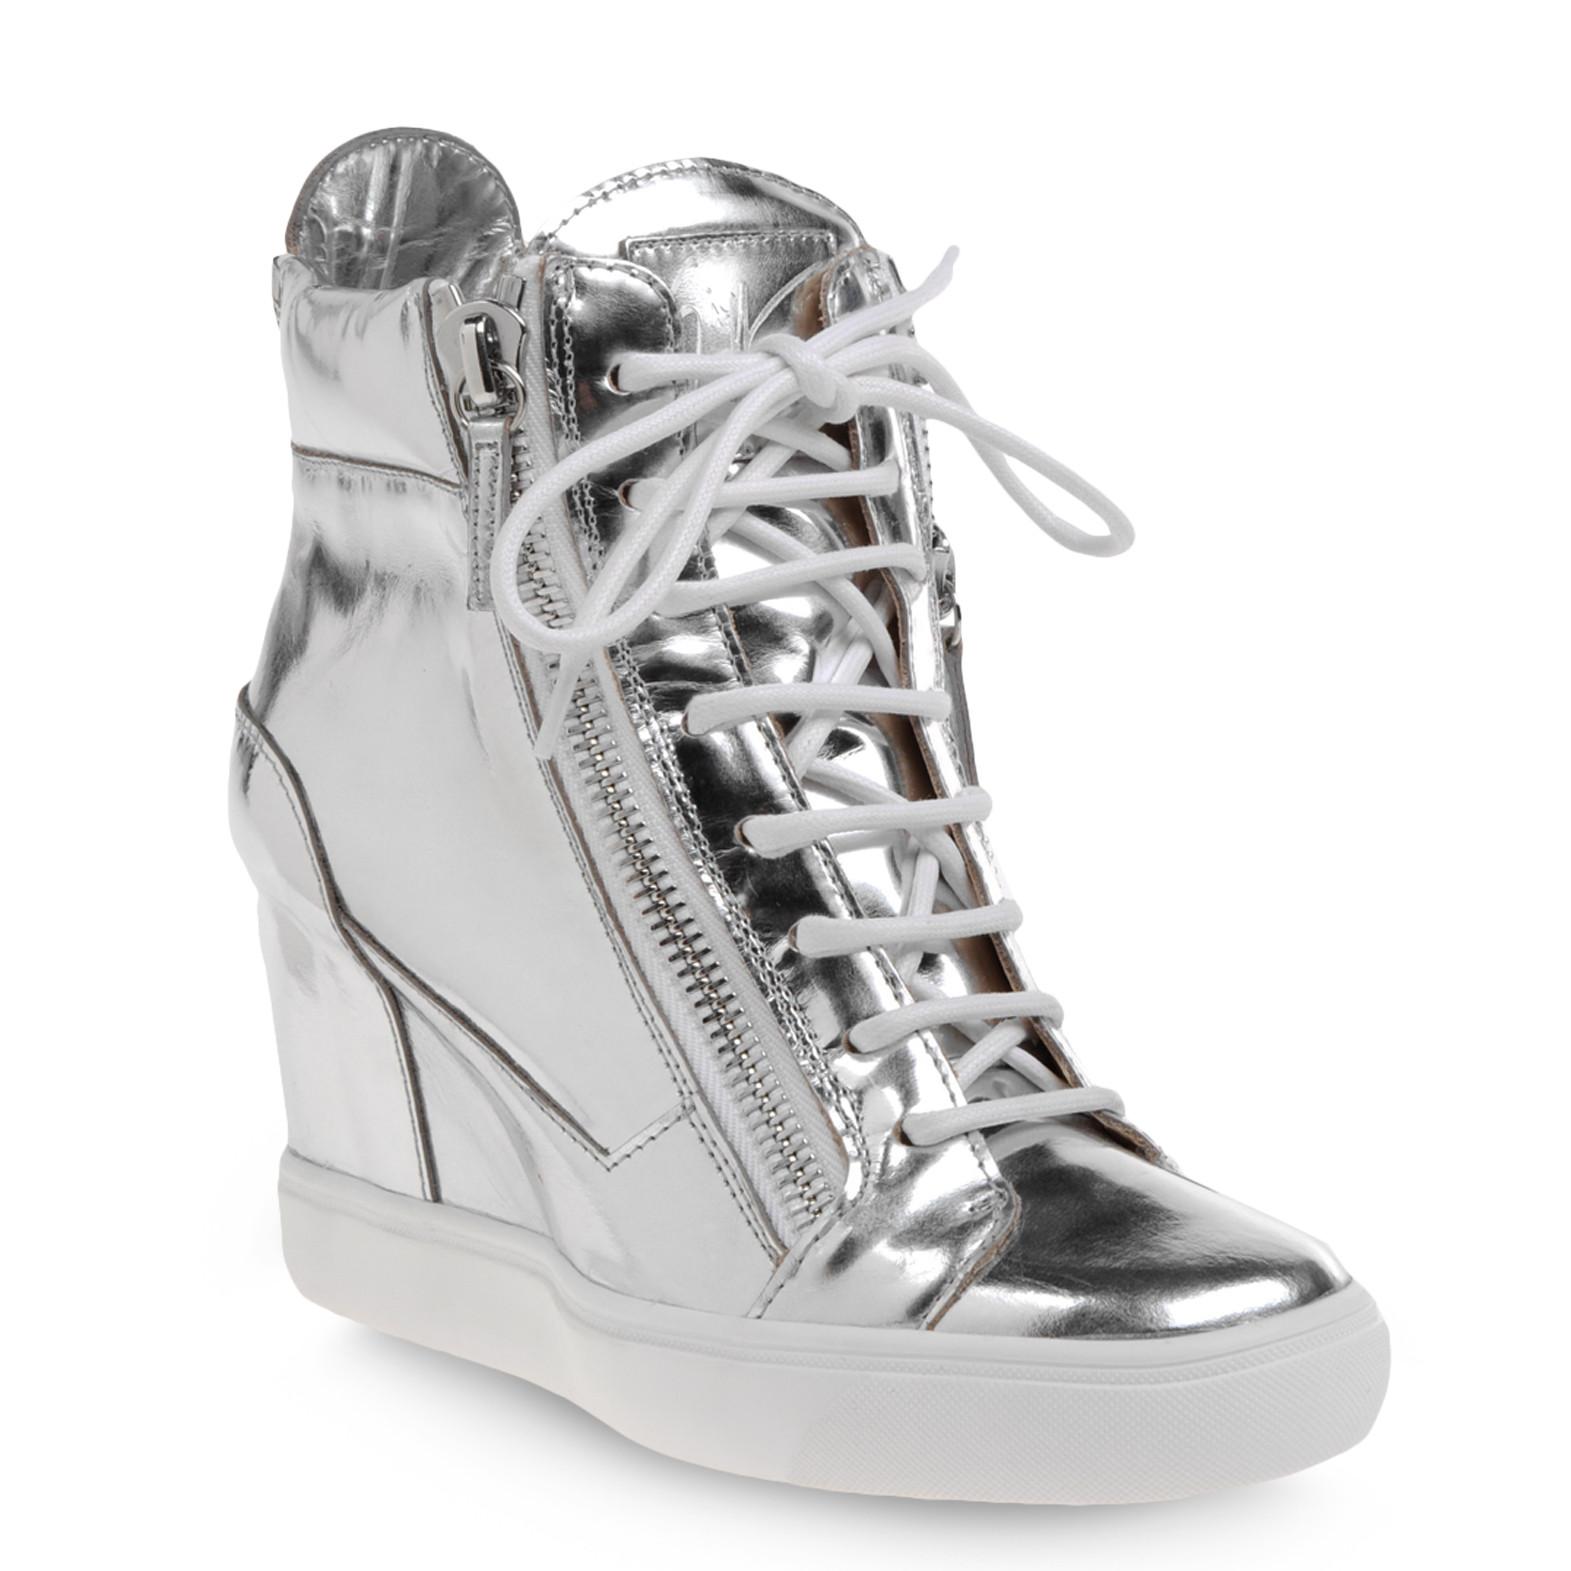 http://1.bp.blogspot.com/-IMDEL_3bbi8/T59s1CrqgaI/AAAAAAAABj0/wh5R9gjQ-jc/s1600/Giuseppe-Zanotti-women-high-top-sneakers-in-silver-mirror-effect-calfskin-1.jpg